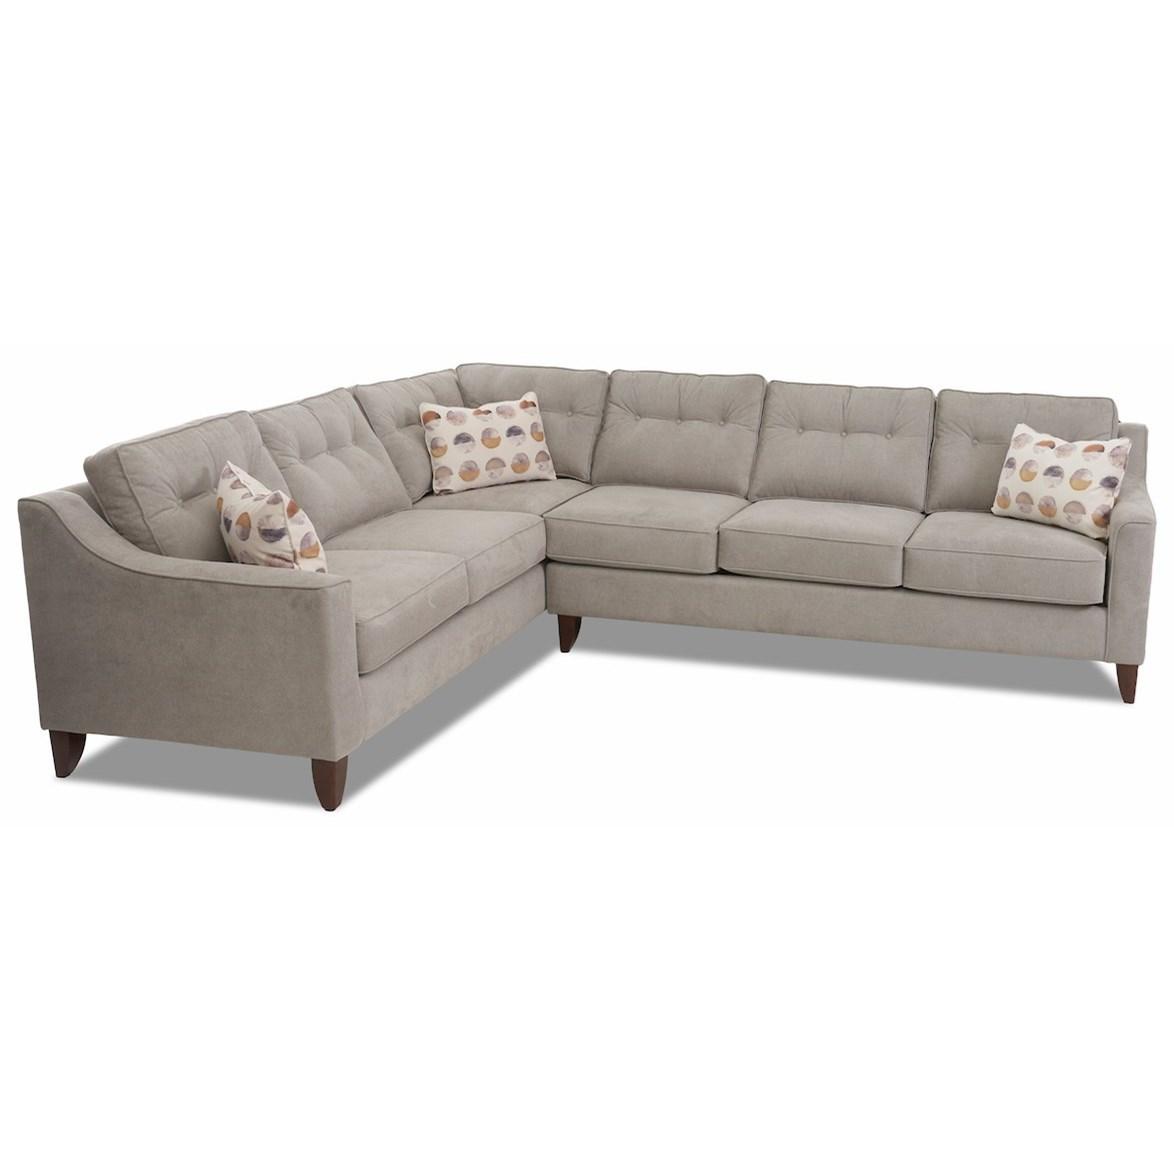 Audrina 2-Piece Sectional Sofa w/ LAF Corner Sofa by Klaussner at Pilgrim Furniture City